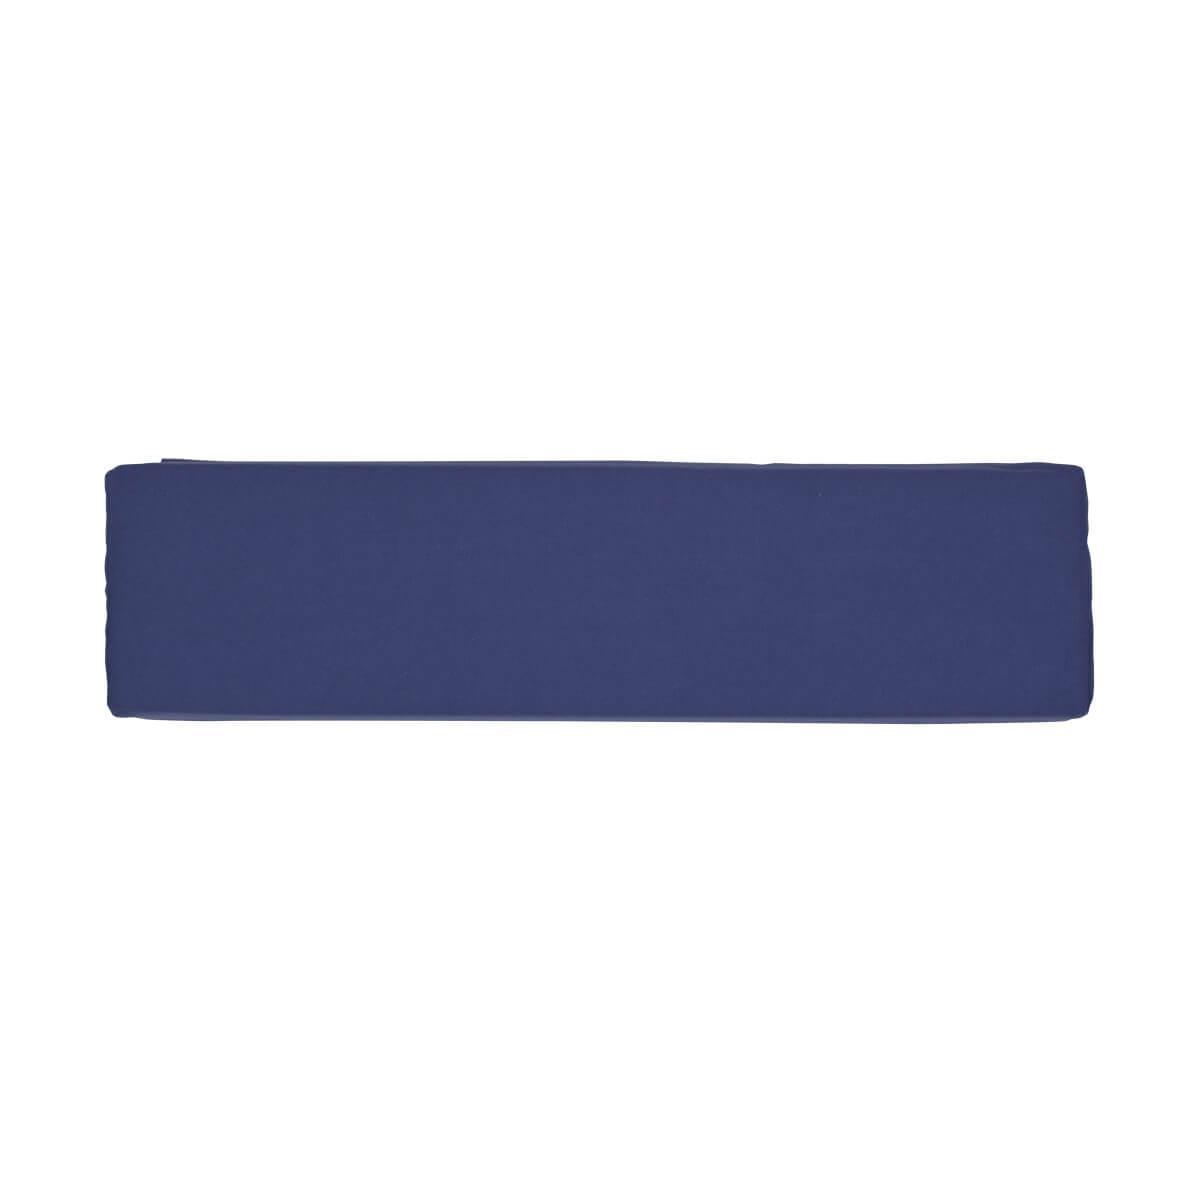 Zargenpolster DESTYLE Debreuyn dunkelblau